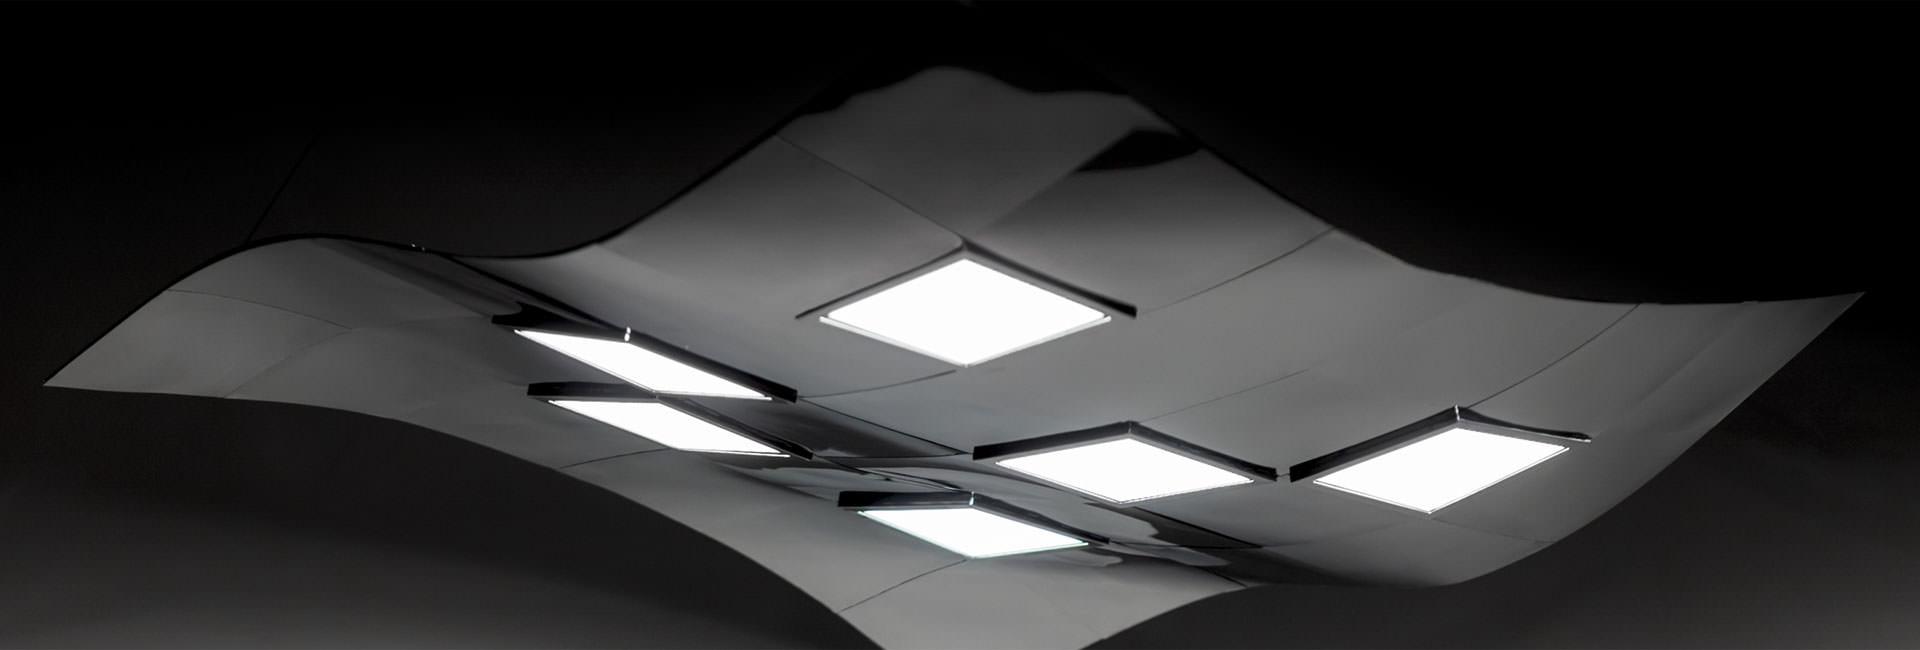 pendant OLED luminaire Pixelate by Birot